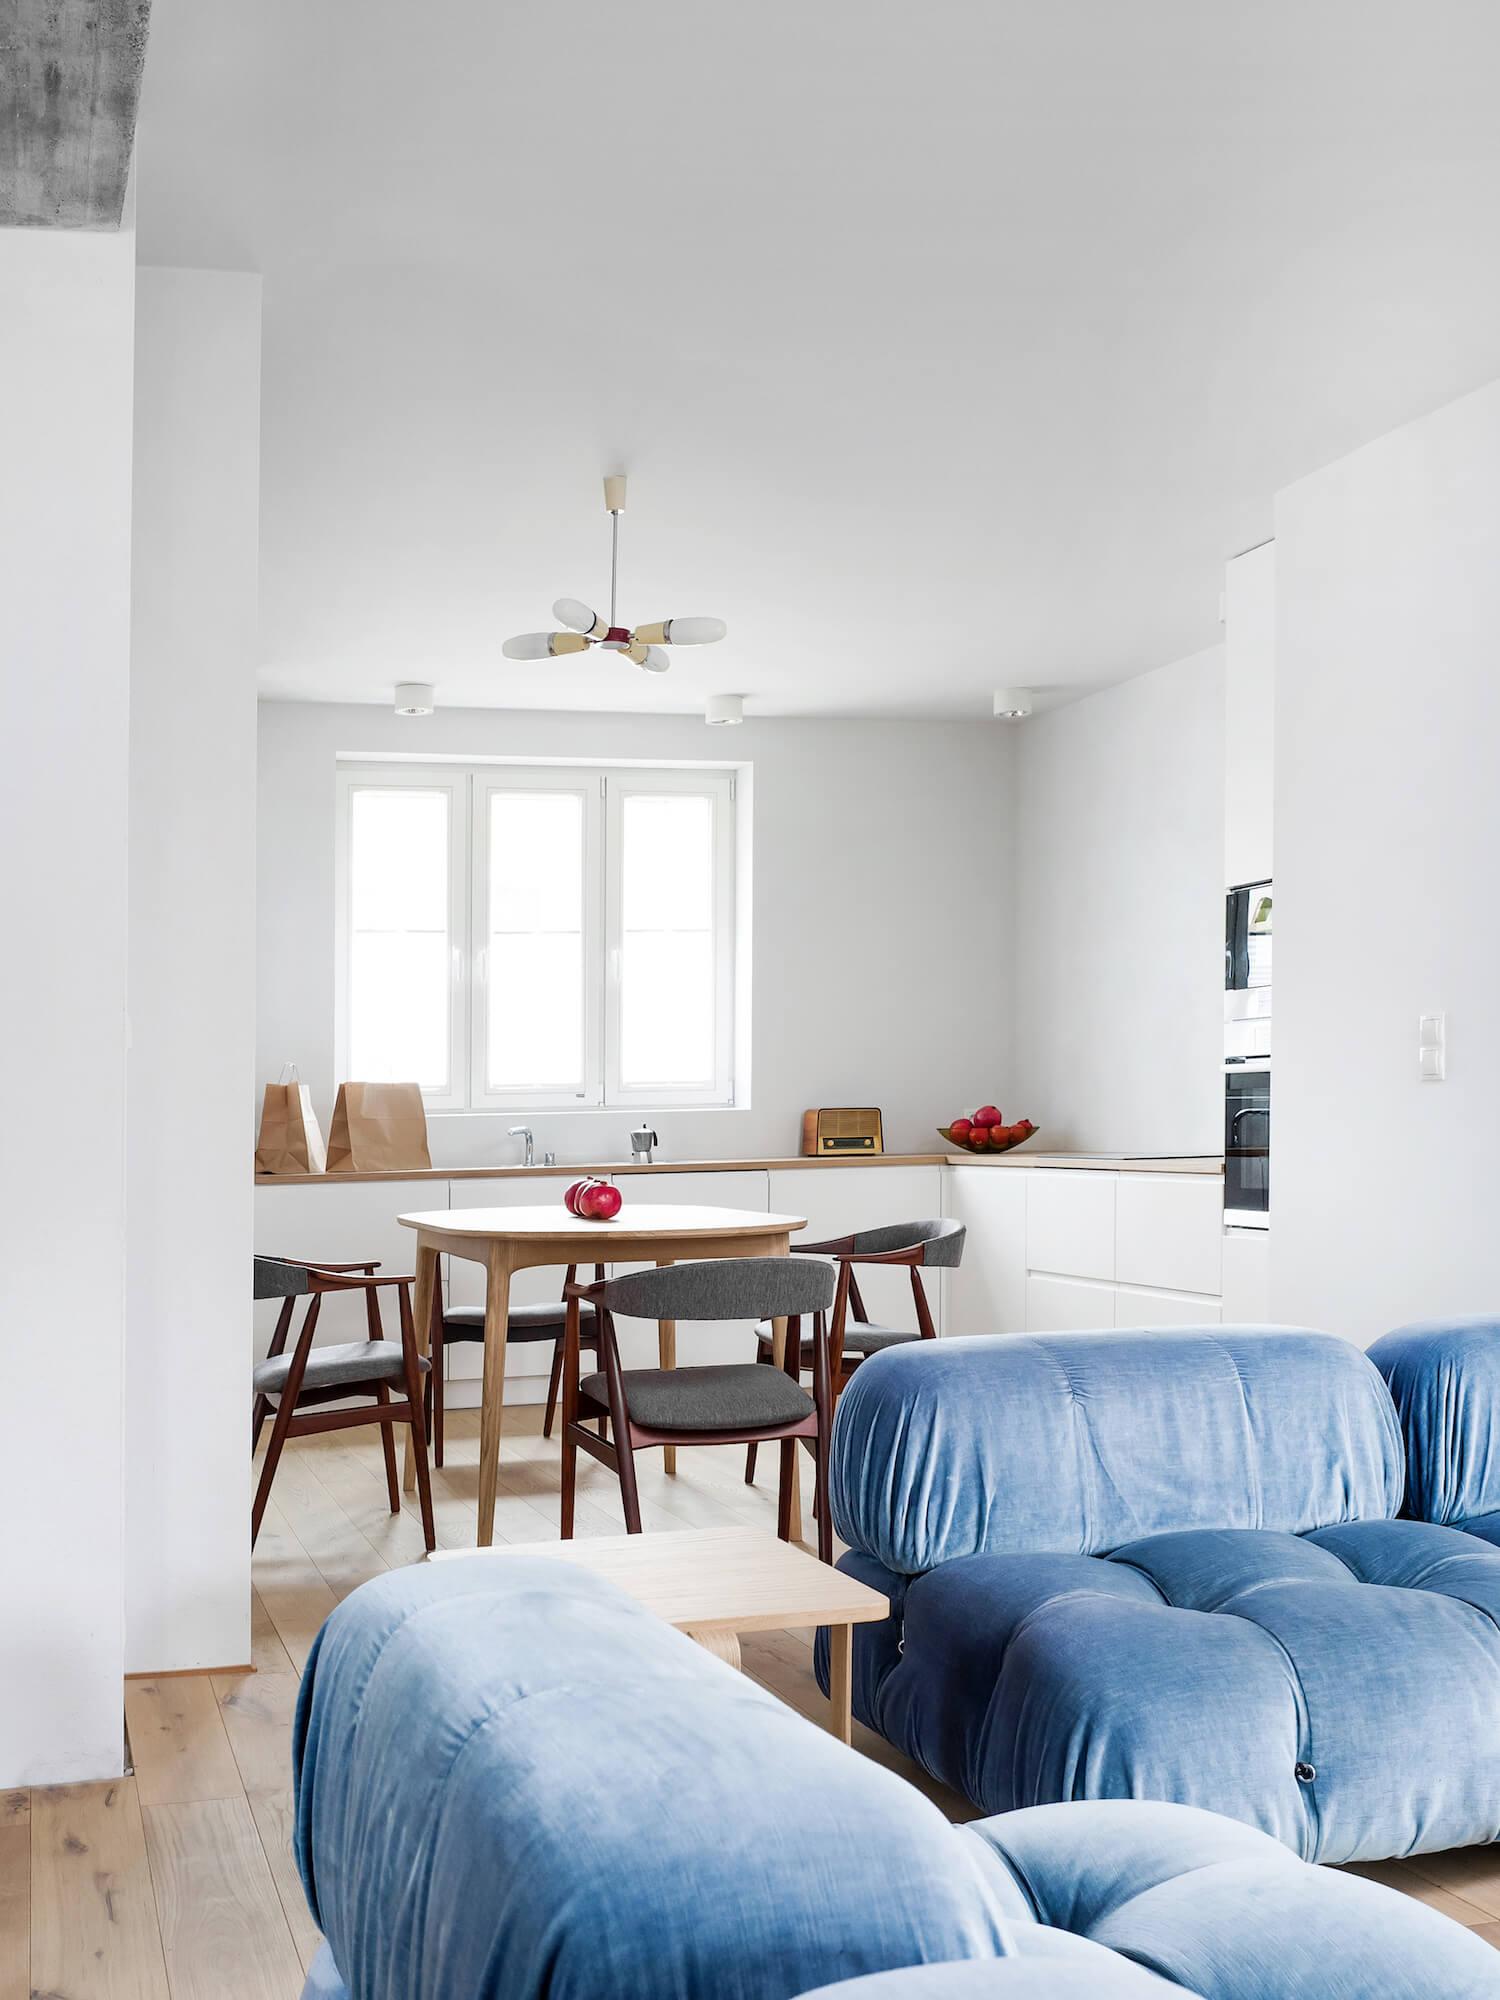 est living house in pogodna 7